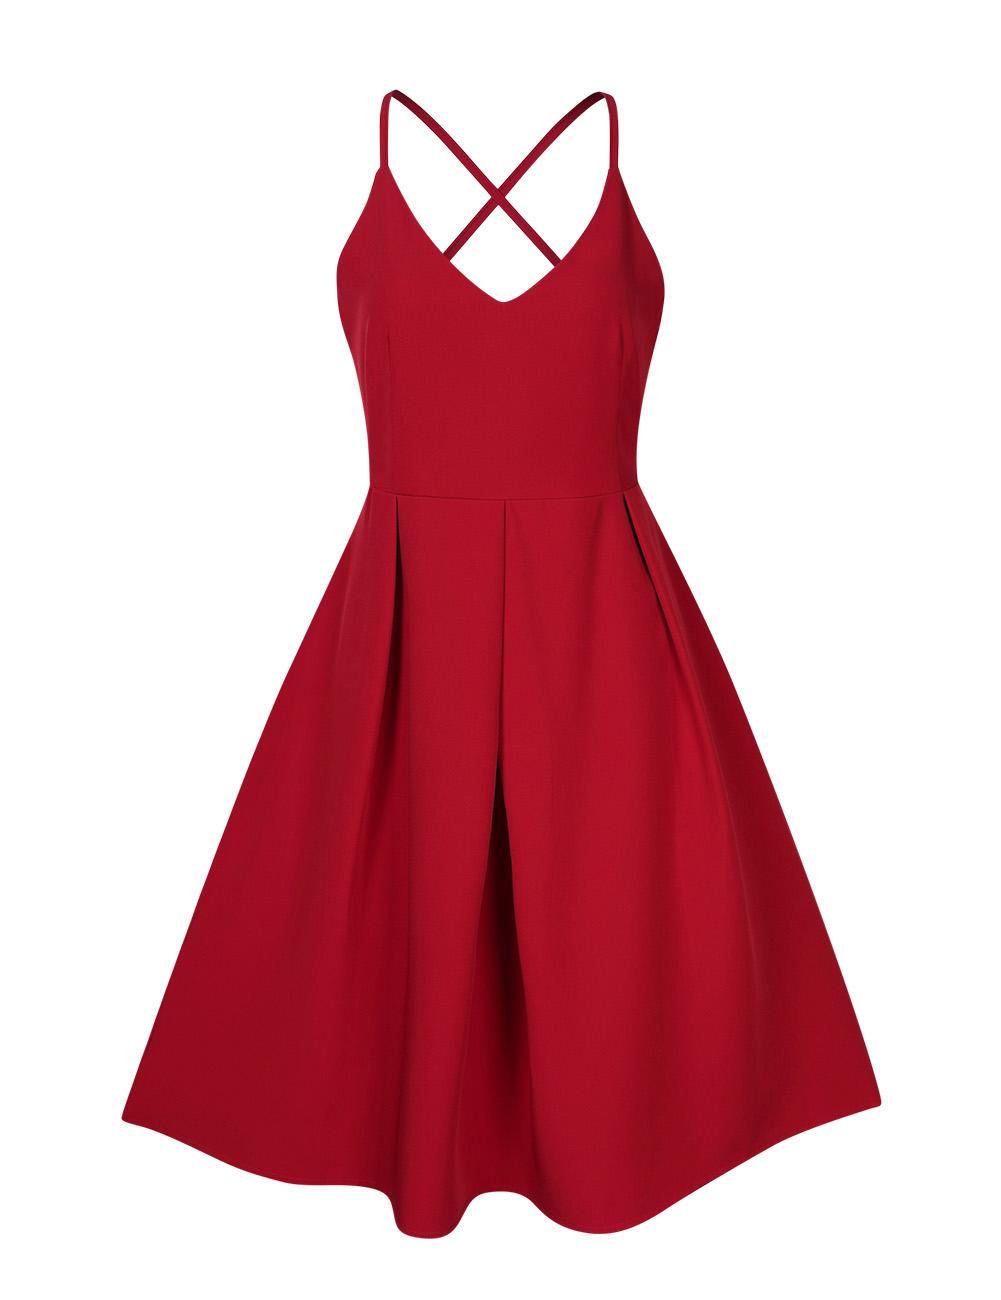 GlorySunshine Women Deep V-Neck Spaghetti Strap Dress Sleeveless Sexy Summer Cocktail Party Dresses Red_L